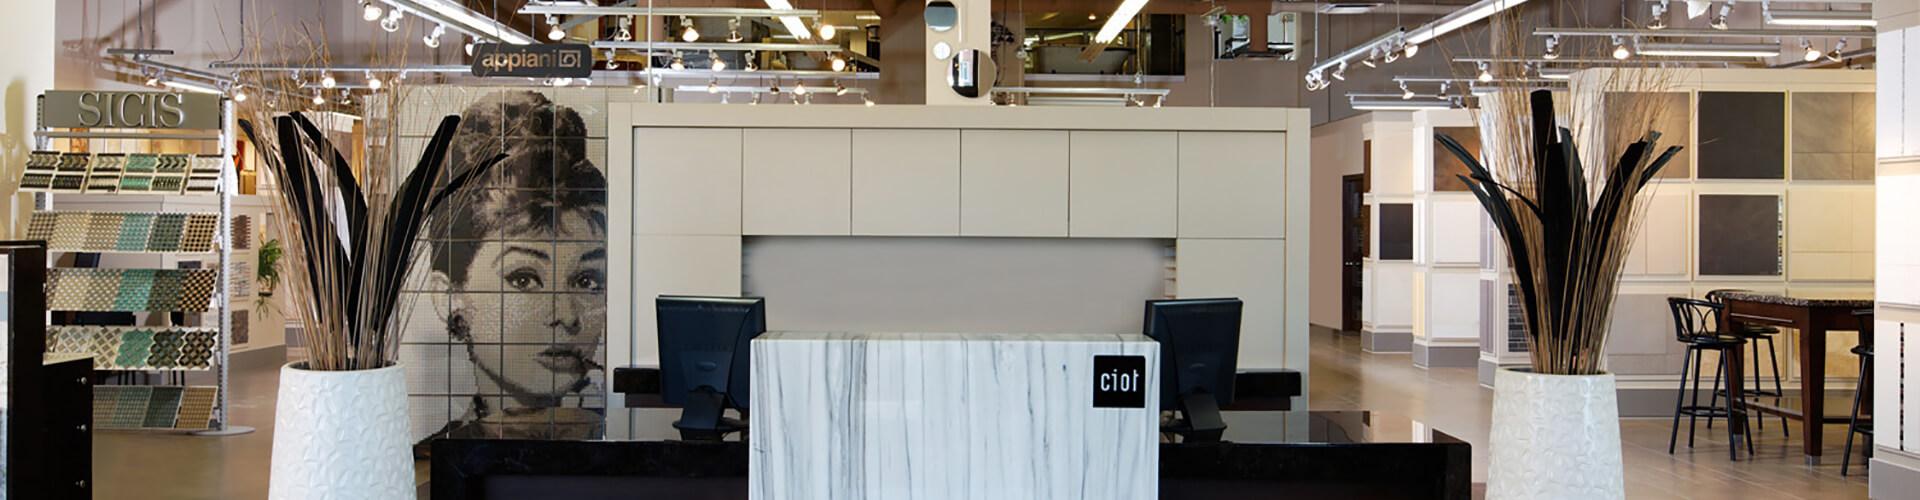 CIOT - Quebec (Showroom & Pro Counter)